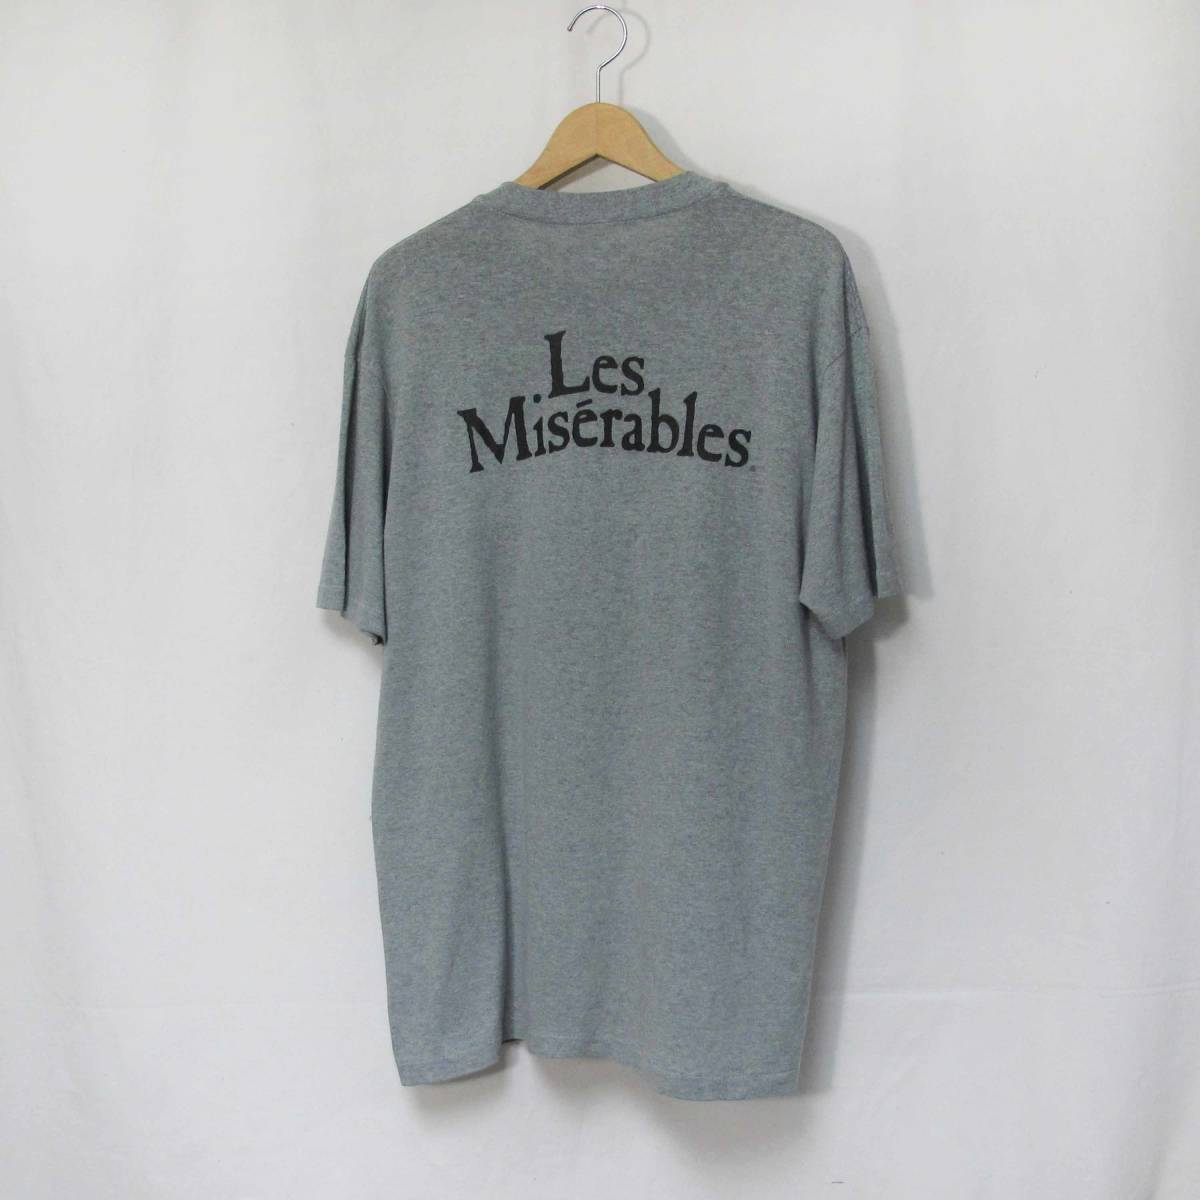 80s Les Miserables Tシャツ USA製 ミュージカル レ・ミゼラブル スウェット SUPREME スケート_画像2